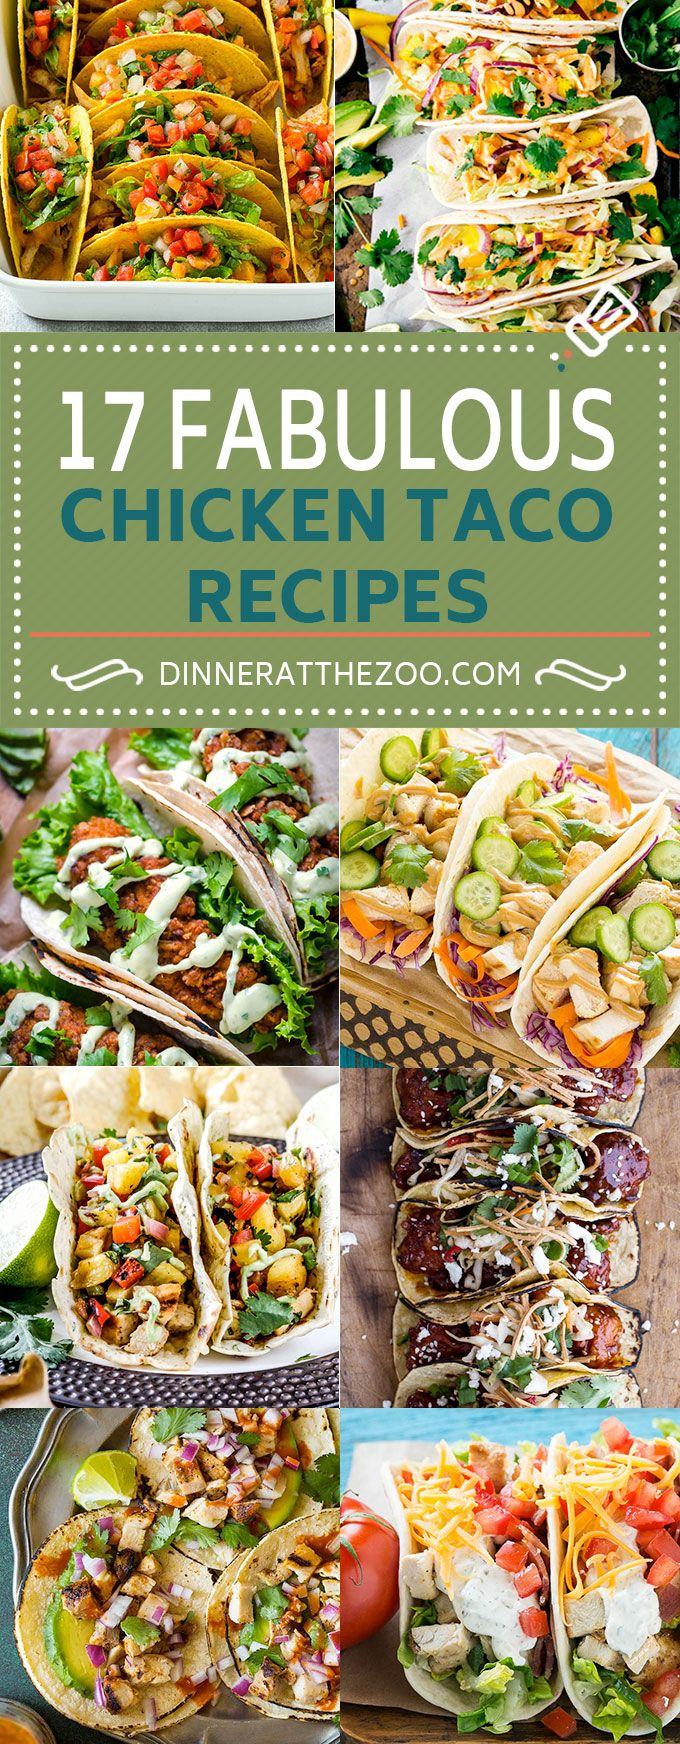 17 Fabulous Chicken Taco Recipes #chickentacorecipes